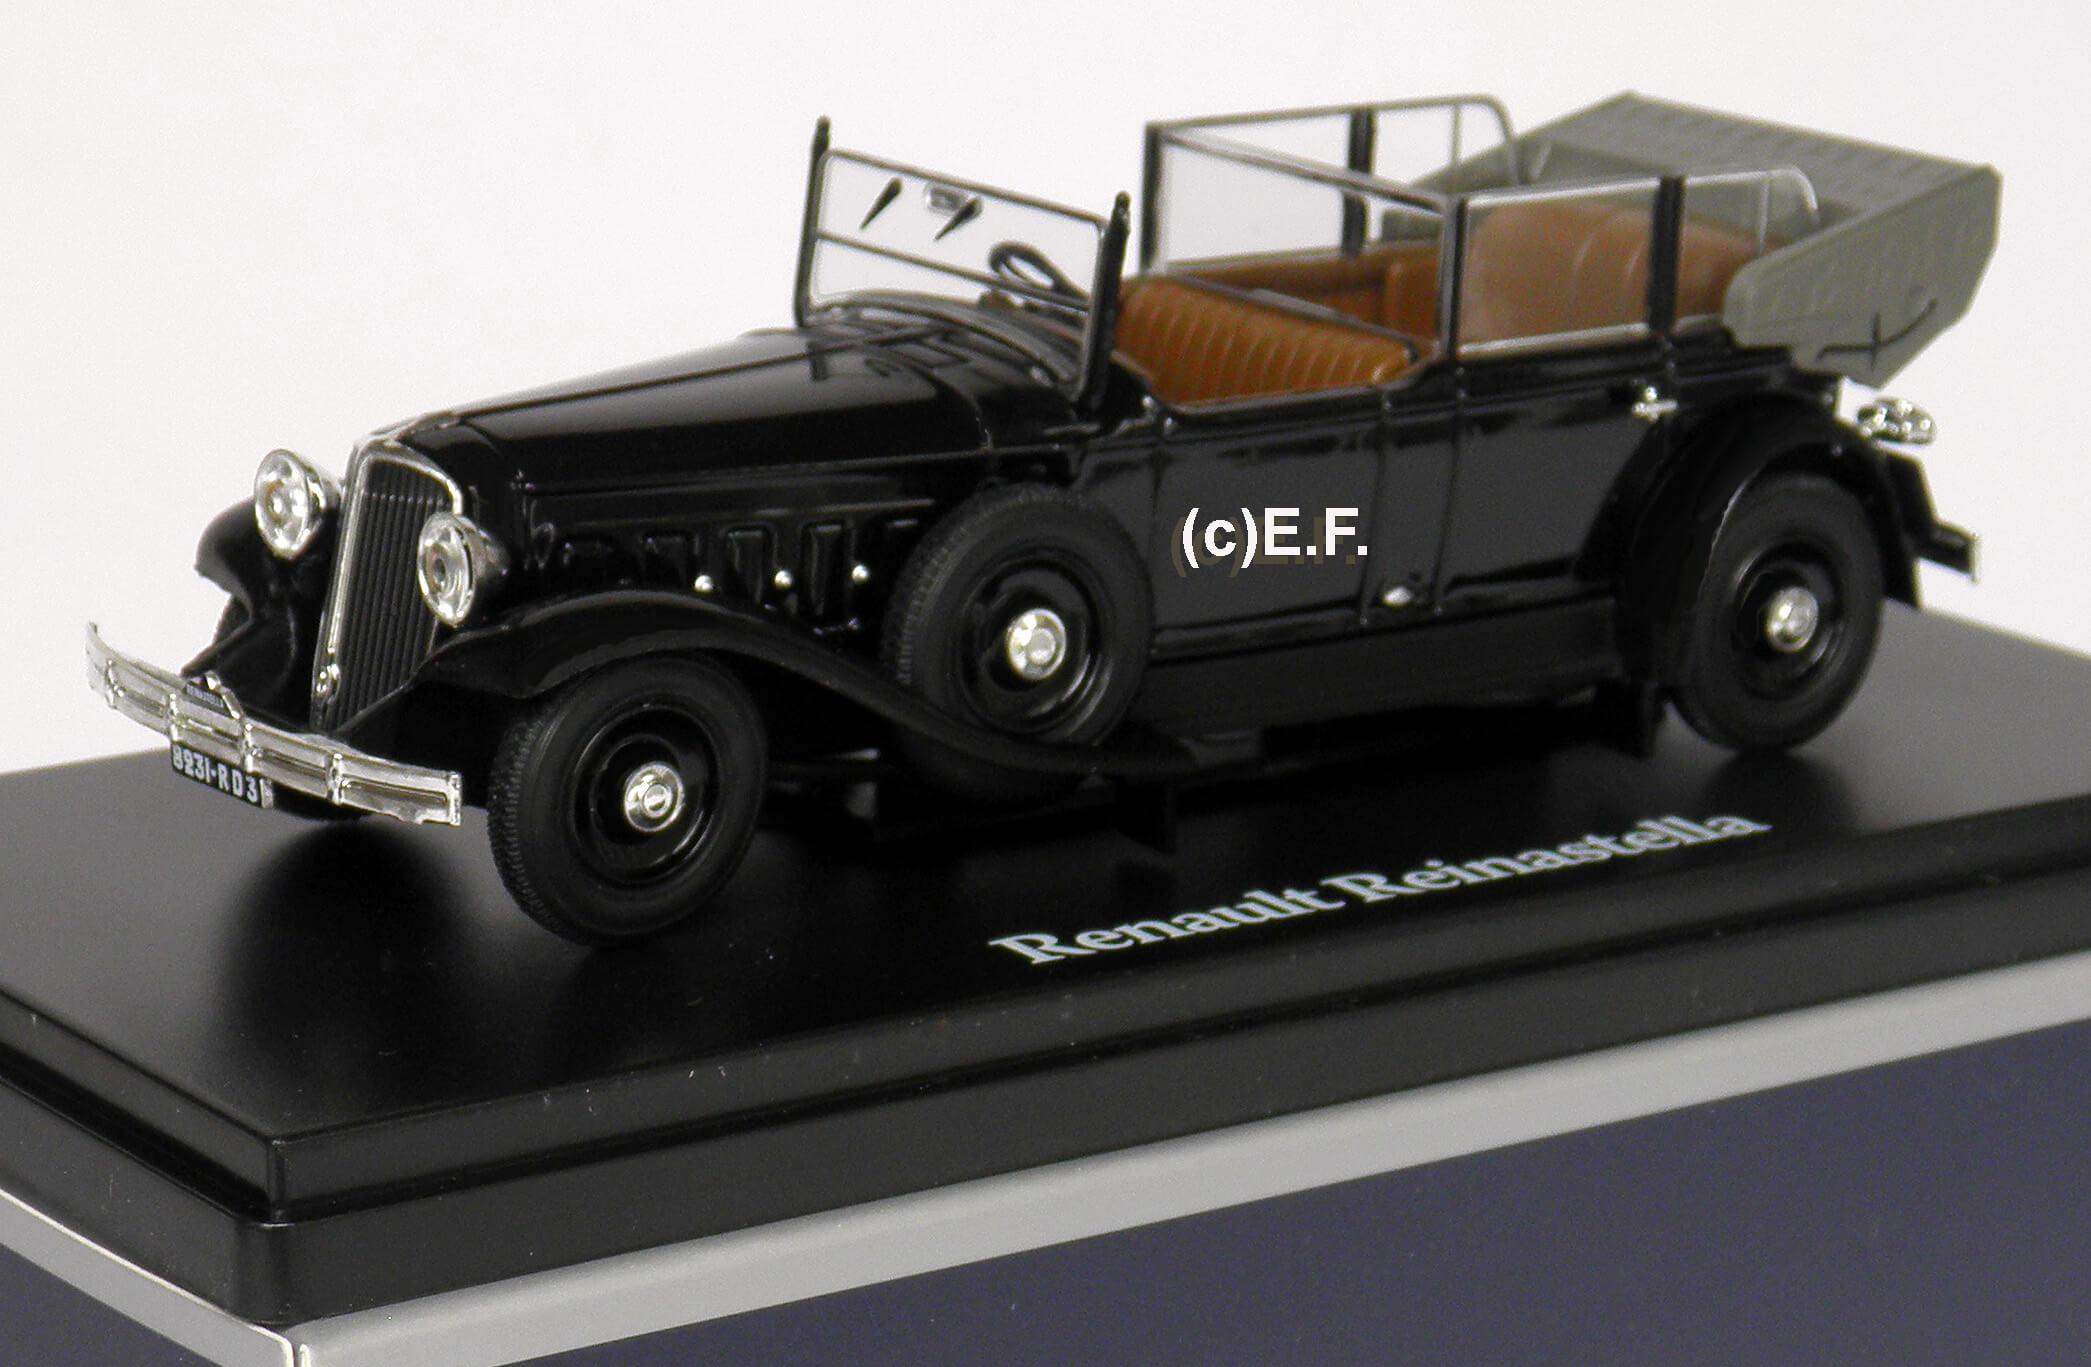 De » Argus Miniature Norev La bf76gy